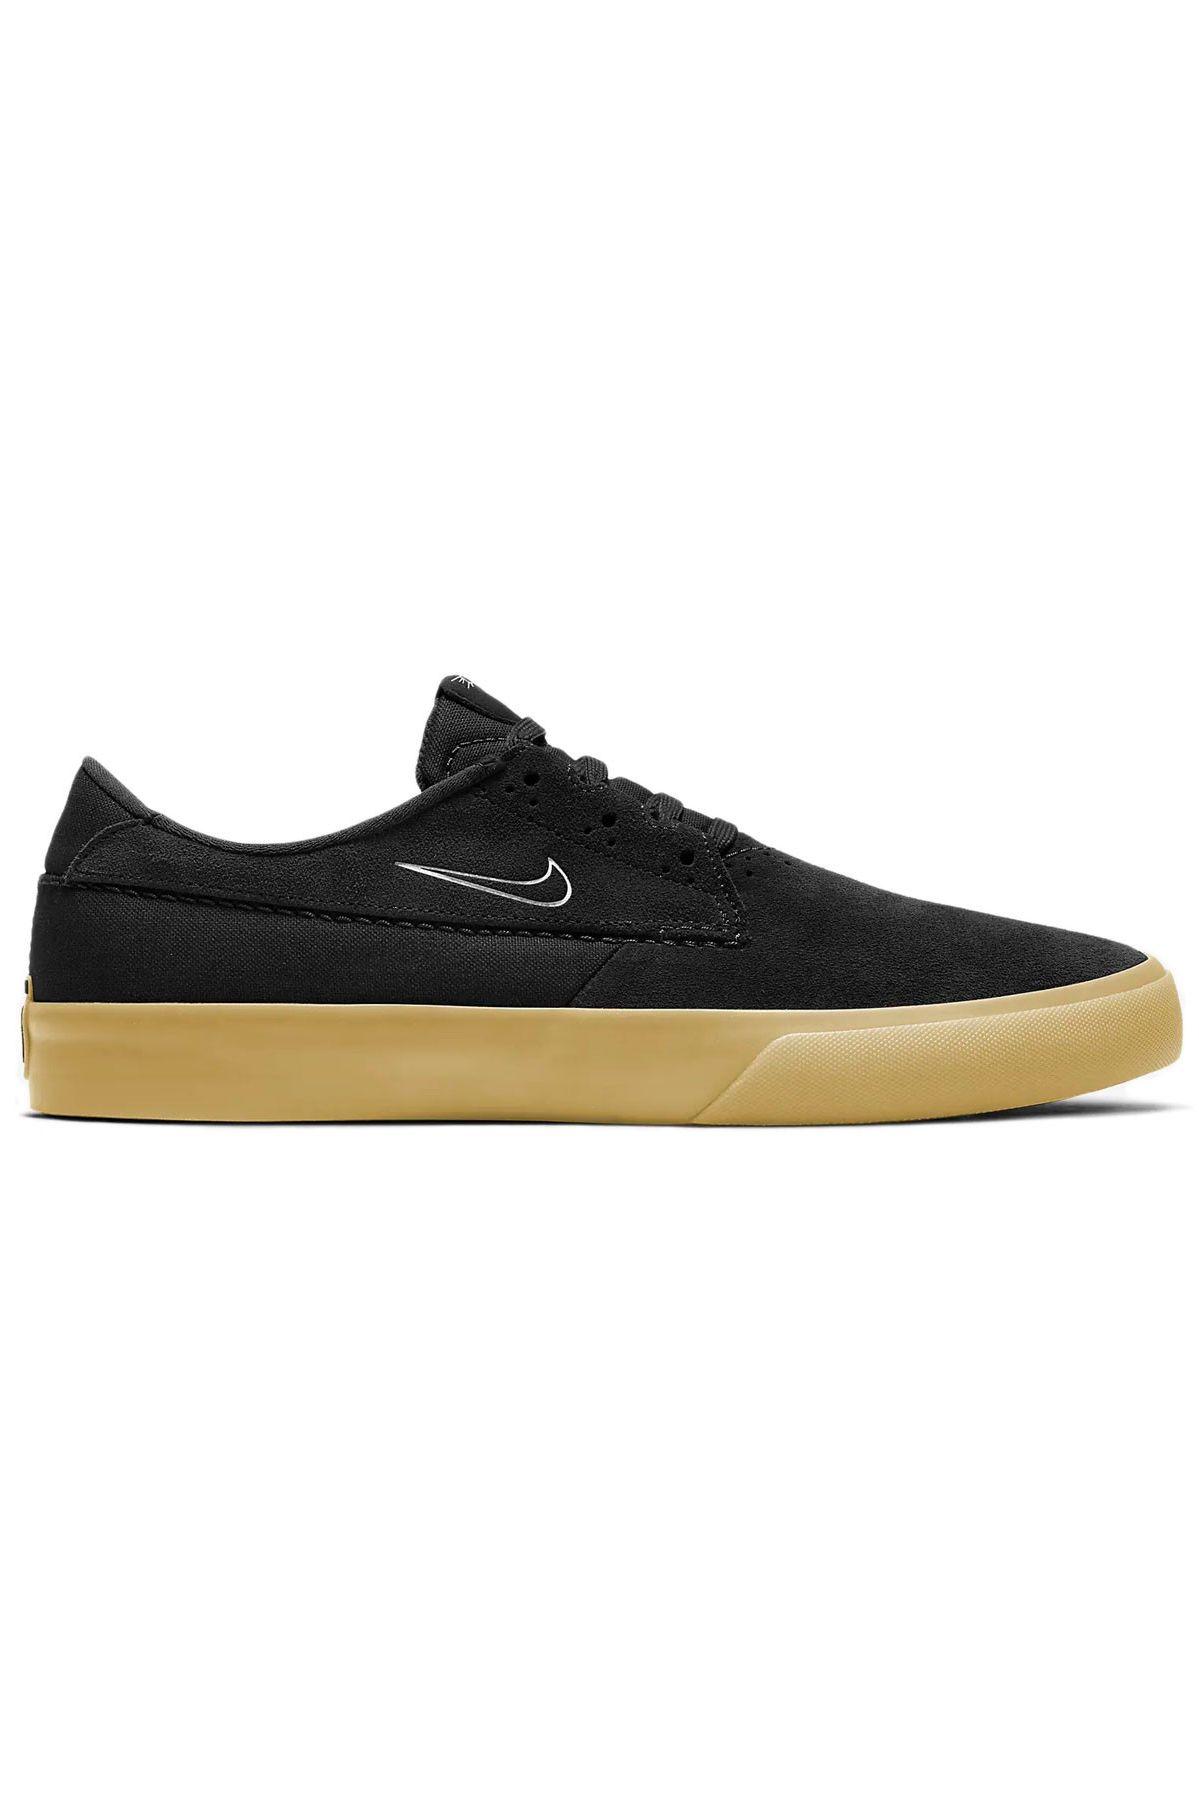 Nike Sb Shoes SHANE Black/White-Black-Black